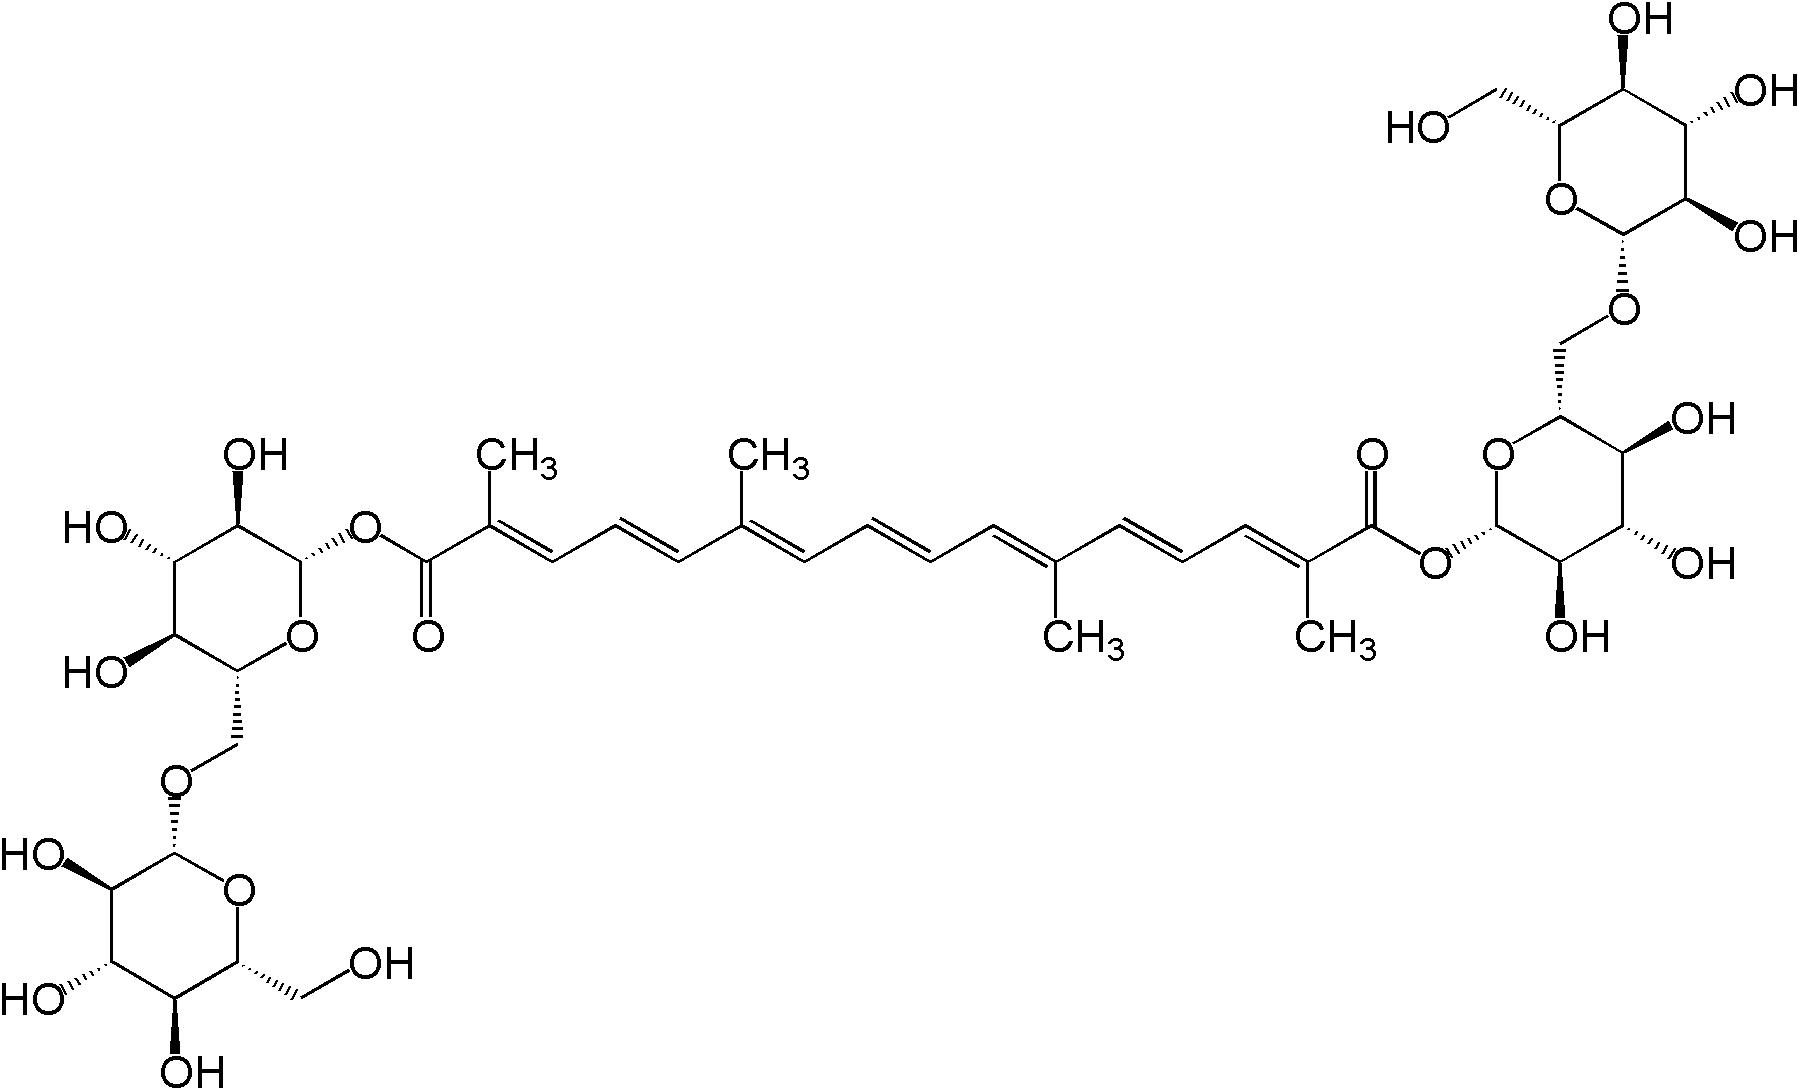 hydrochlorothiazide wikipedia